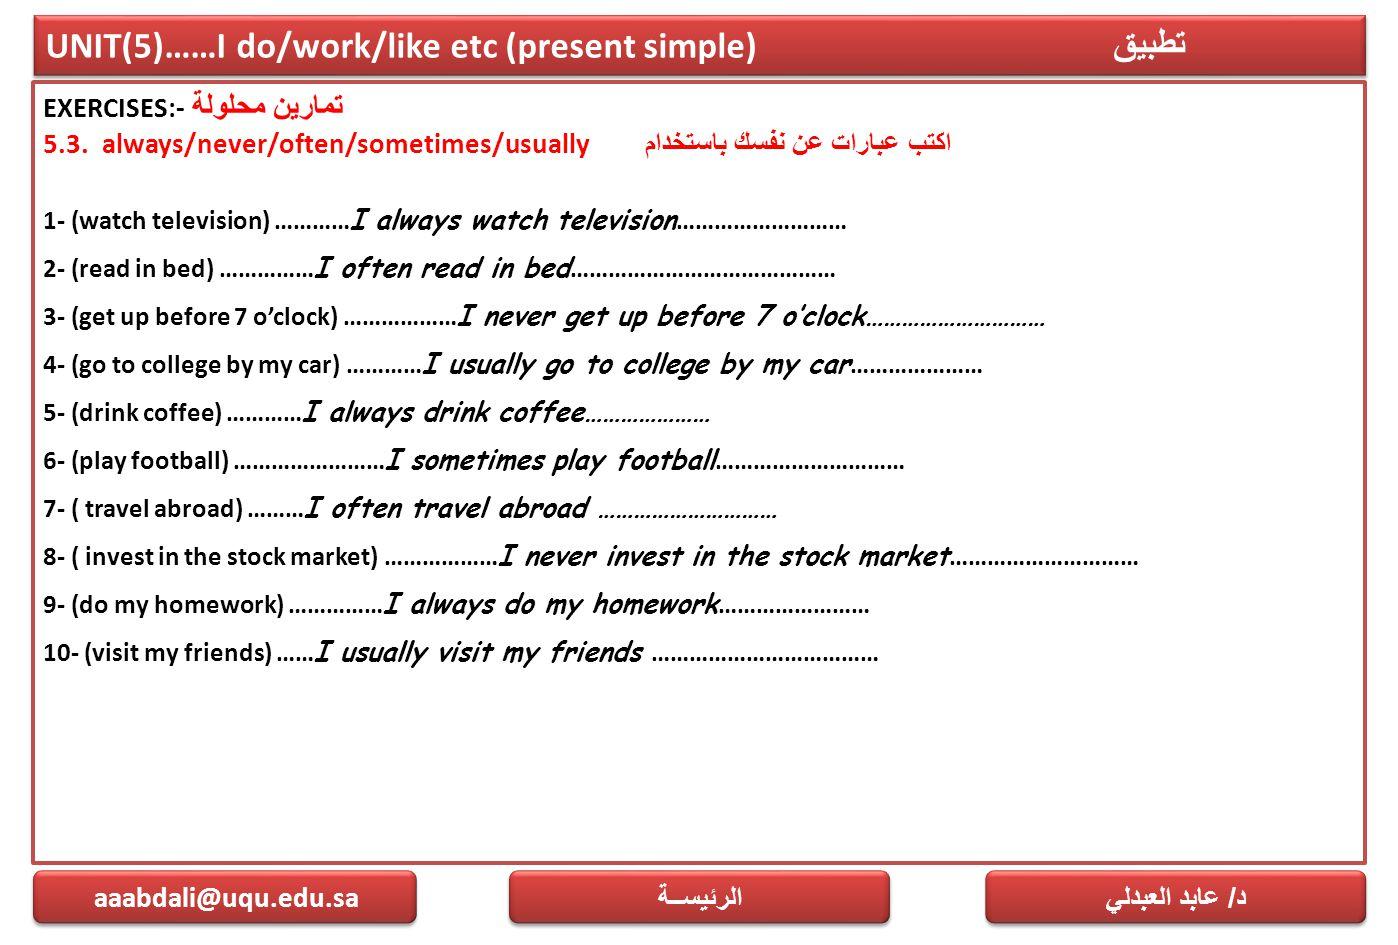 UNIT(5)……I do/work/like etc (present simple) تطبيق EXERCISES:- تمارين محلولة 5.3. always/never/often/sometimes/usually اكتب عبارات عن نفسك باستخدام 1-